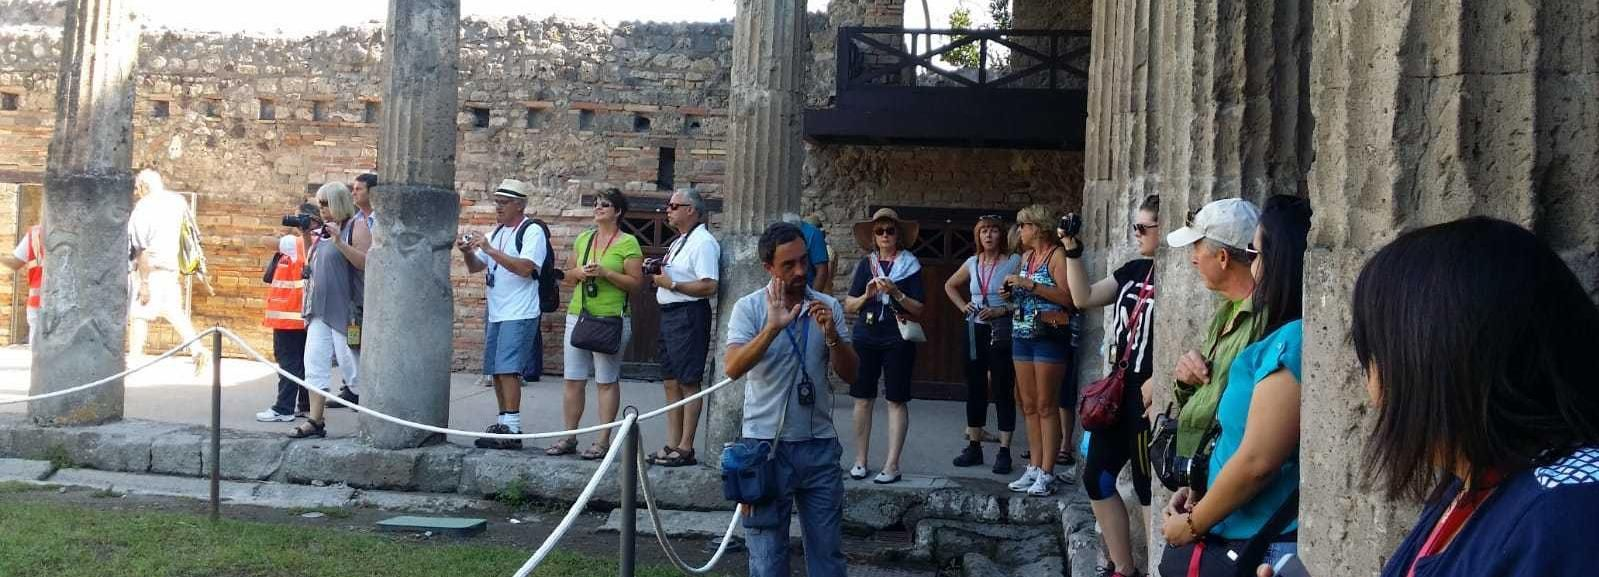 Pompeii: Half-Day Excursion from Naples or Sorrento